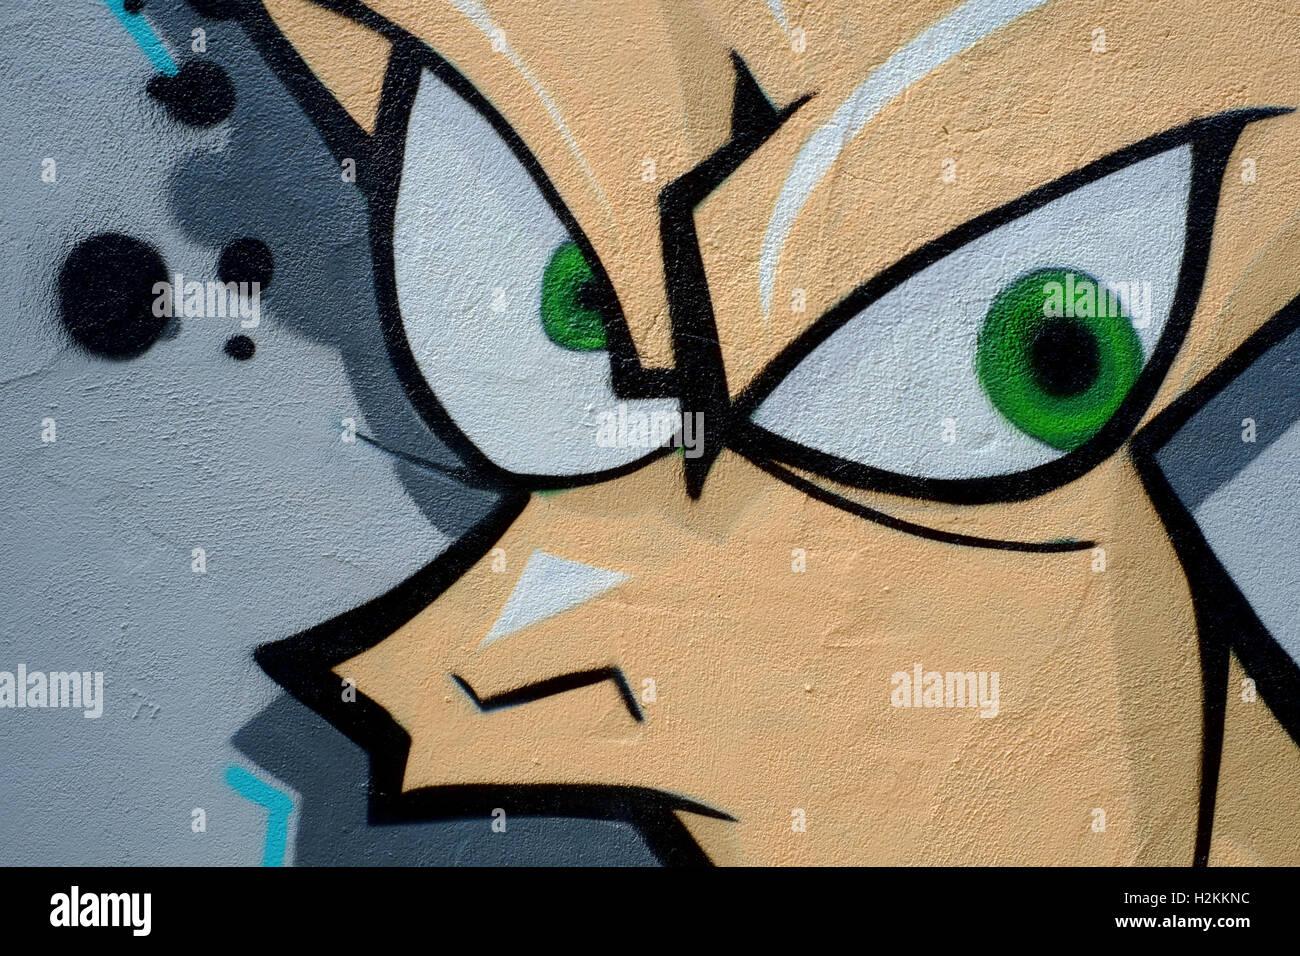 Graffiti wall art uk - Stock Photo Colourful Graffiti Wall Art Spray Painted In Urban Area England Uk